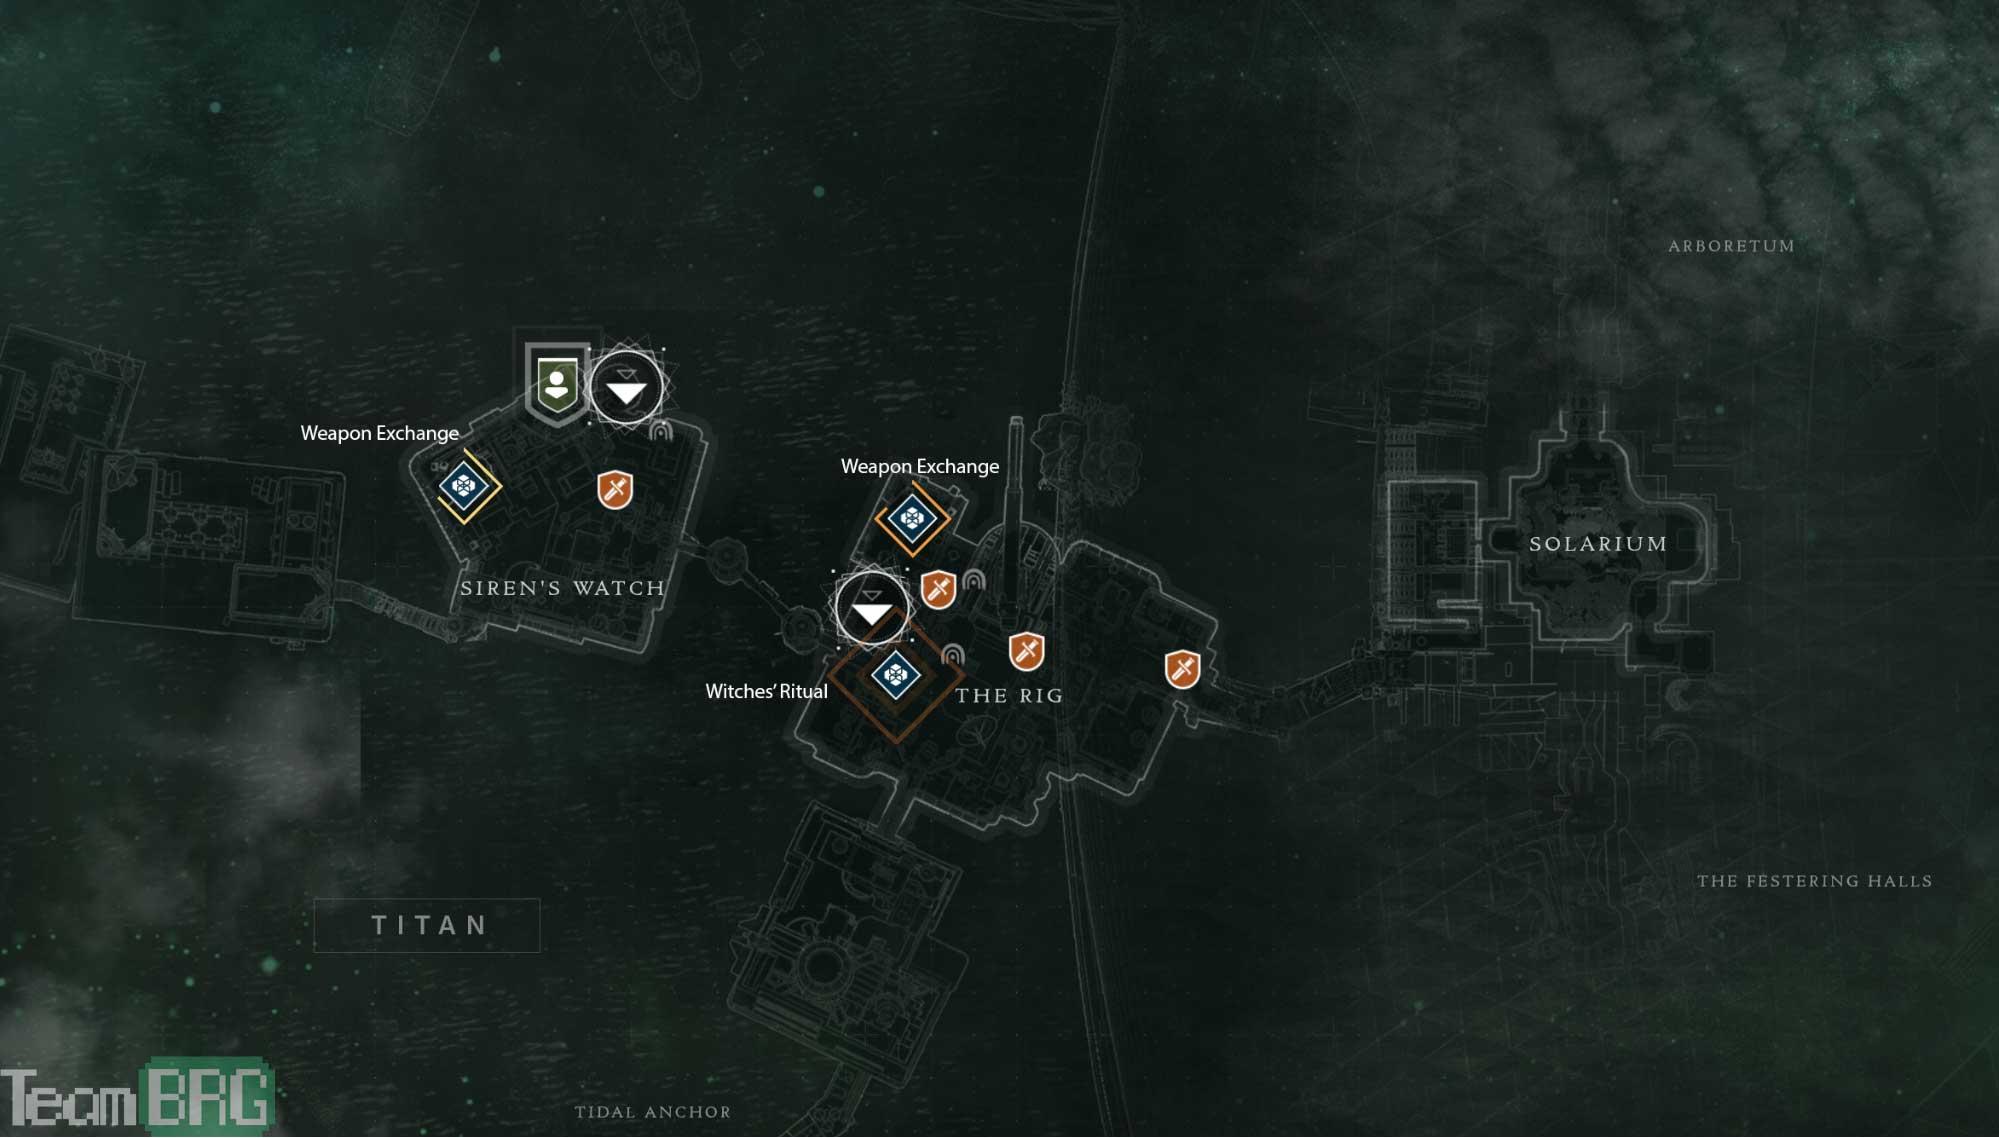 Destiny 2 Public Events Guide, List & Walkthroughs | Team BRG